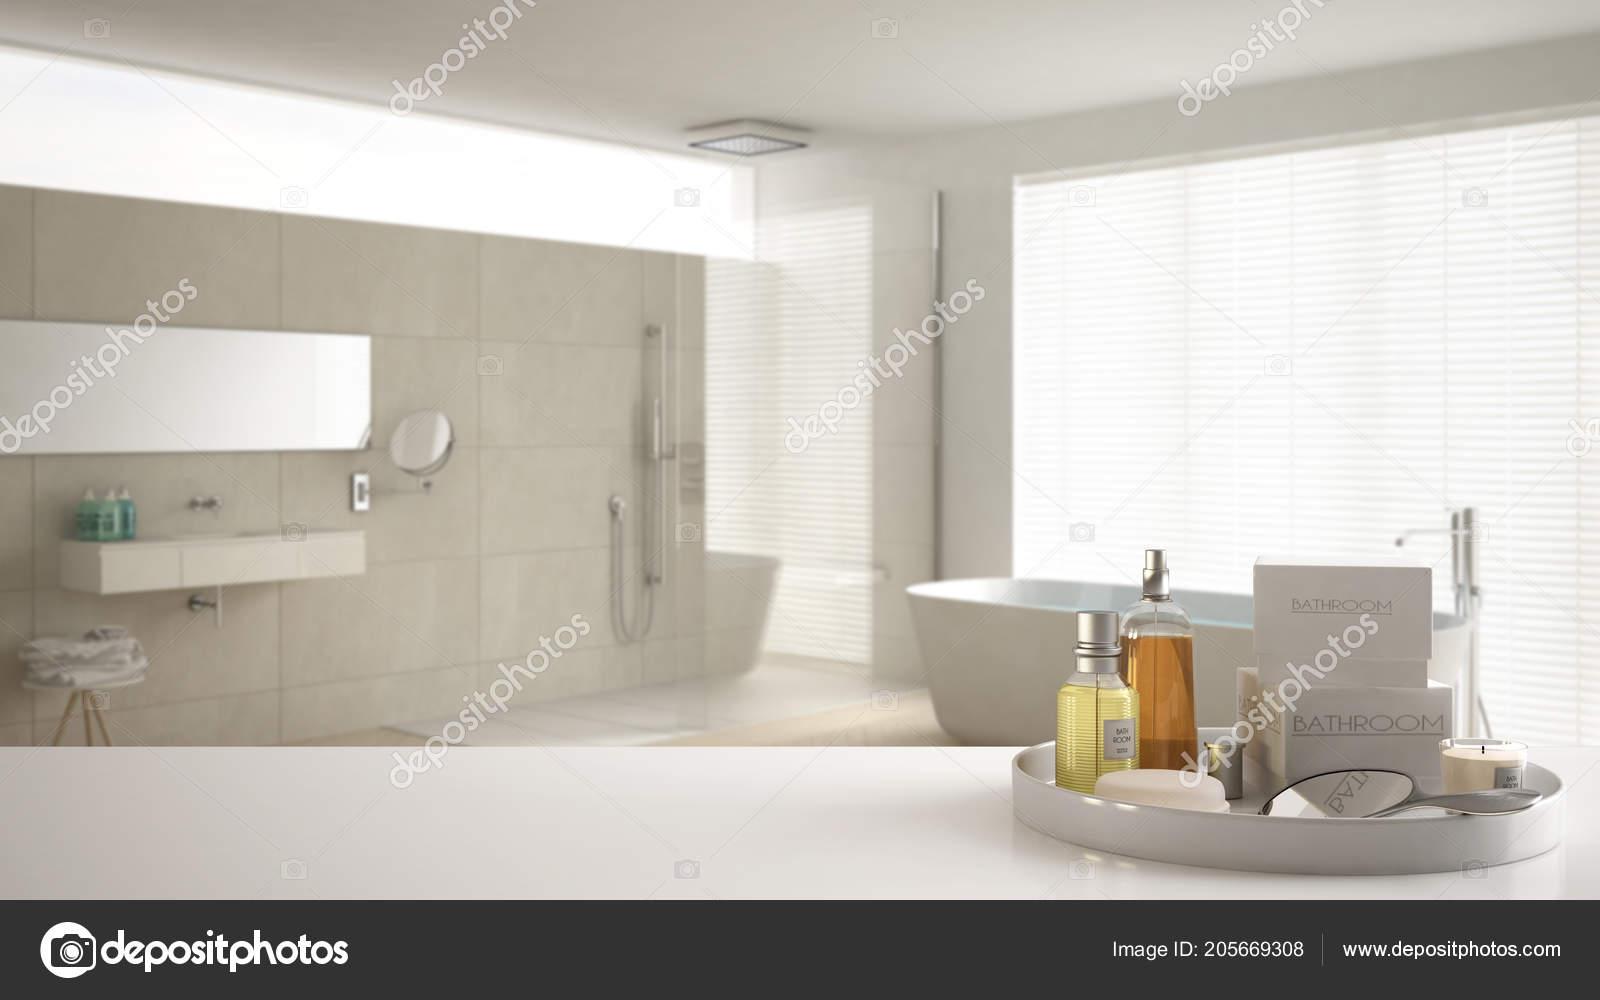 Spa Hotel Bad Konzept Weisse Tischplatte Oder Regal Bade Accessoires